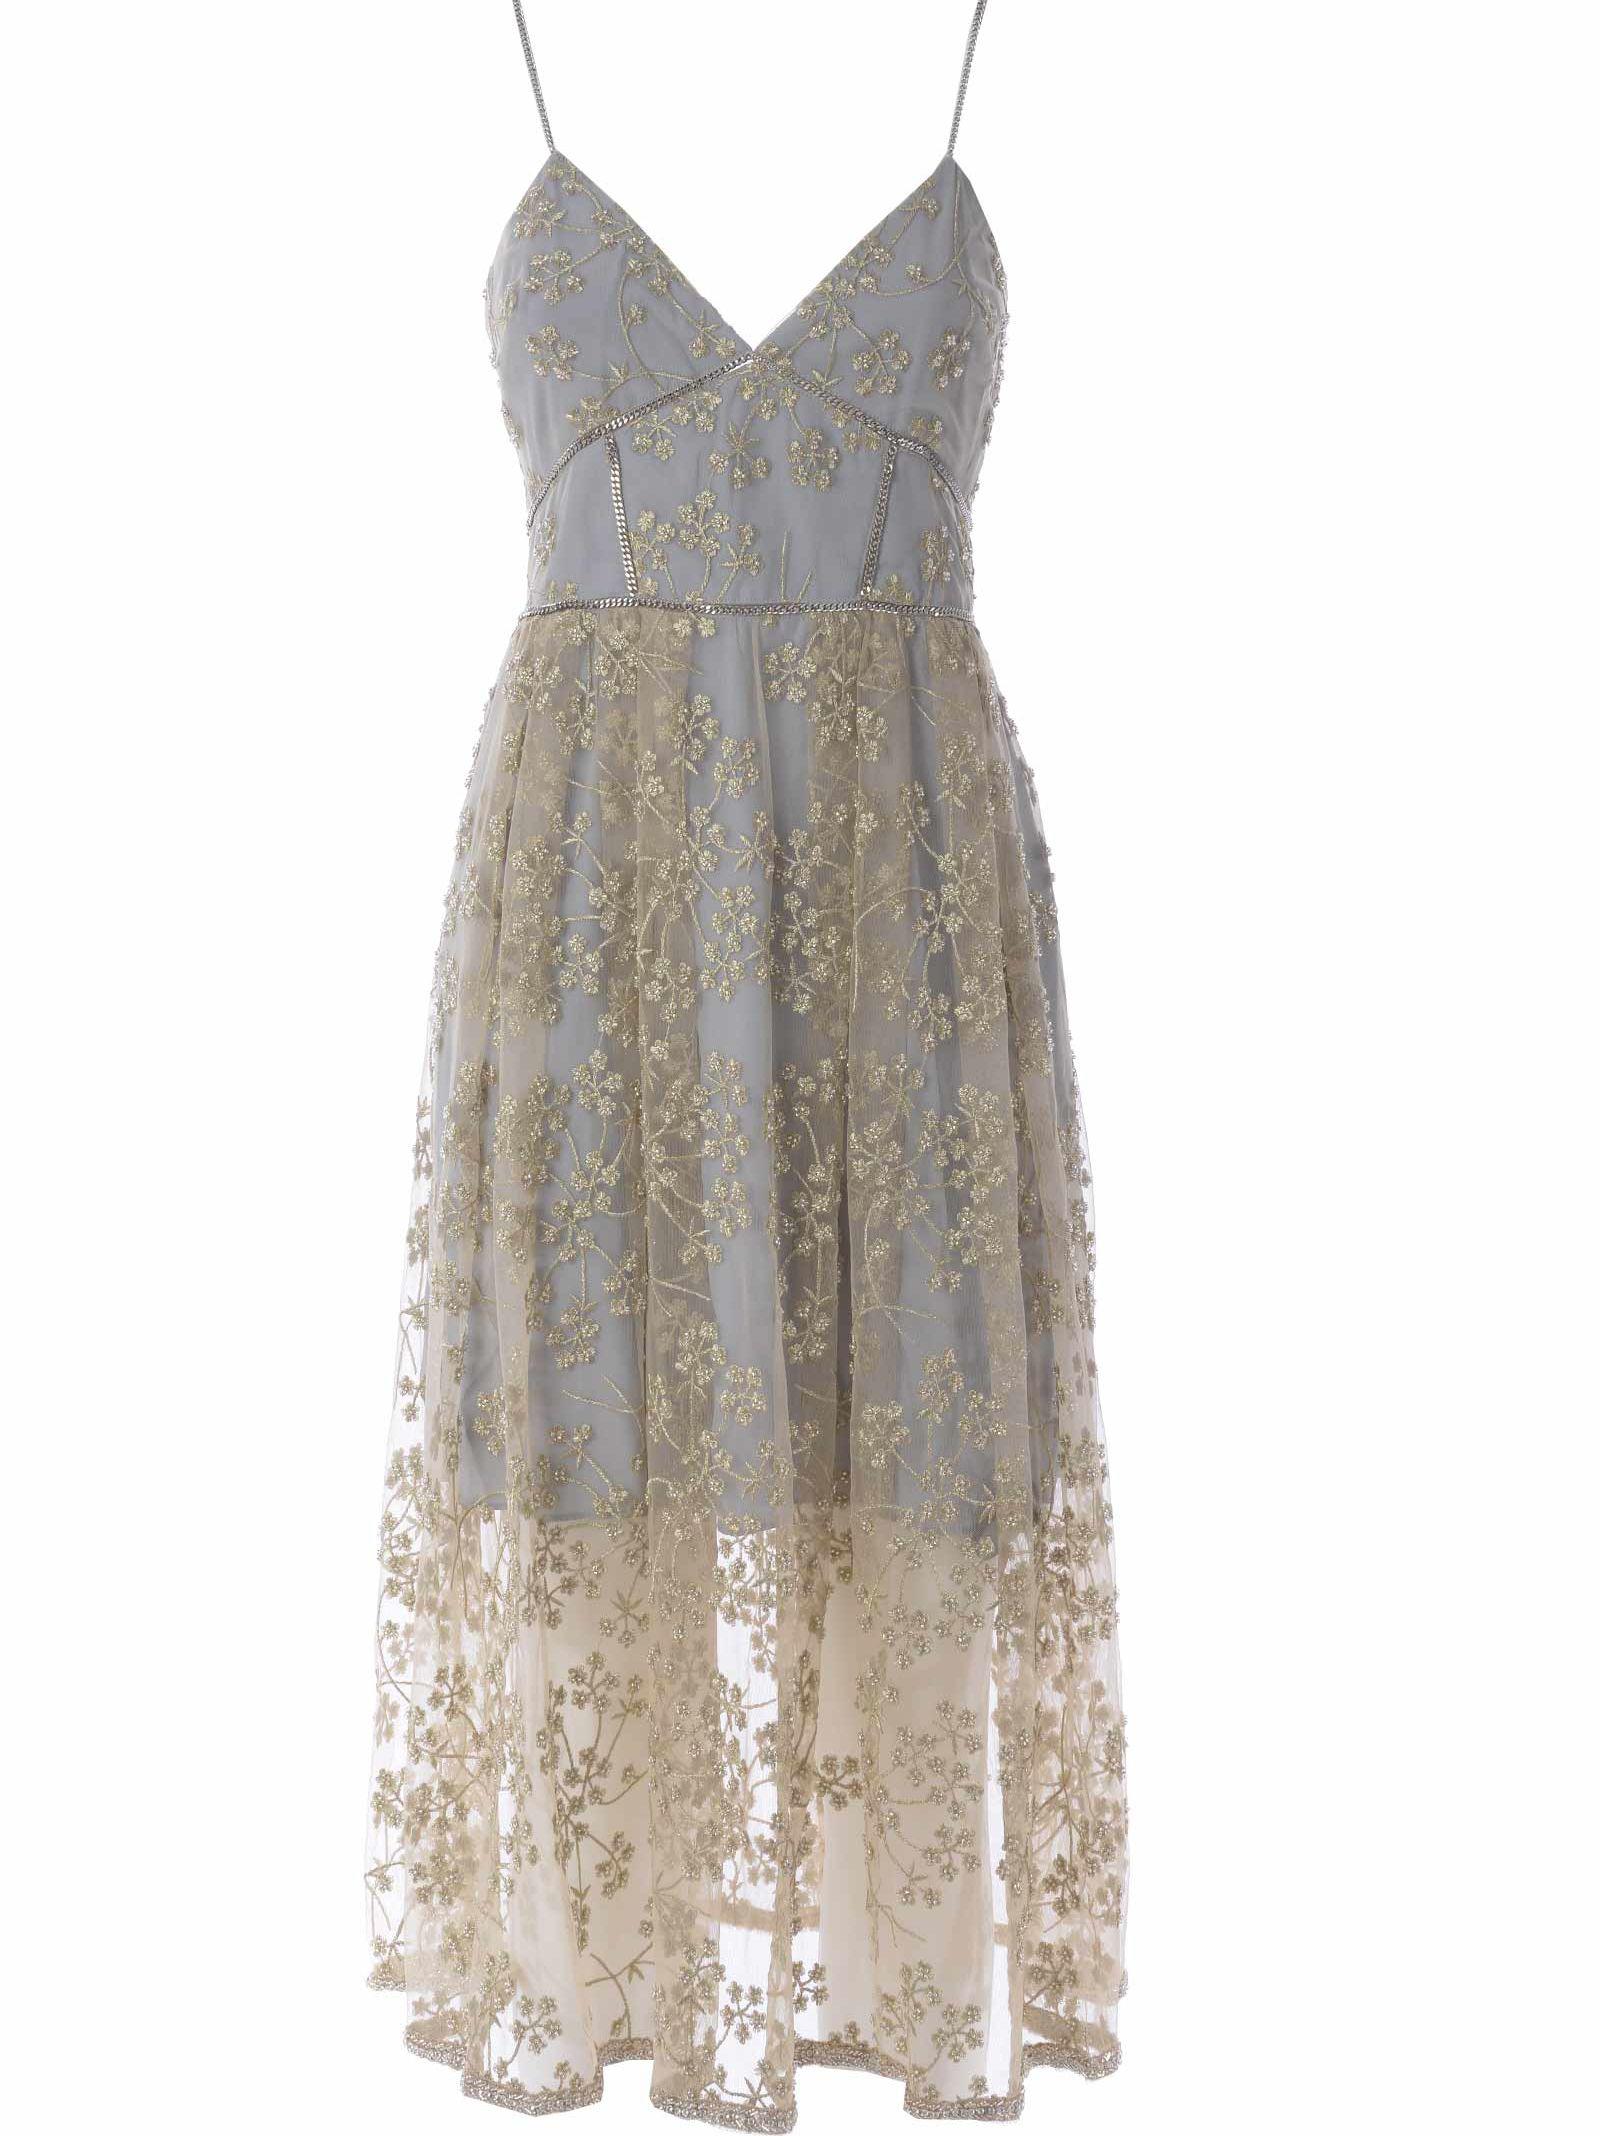 c42d4cdcd3c Self-Portrait Floral Embroidered Mesh Midi Dress In Polvere Oro ...